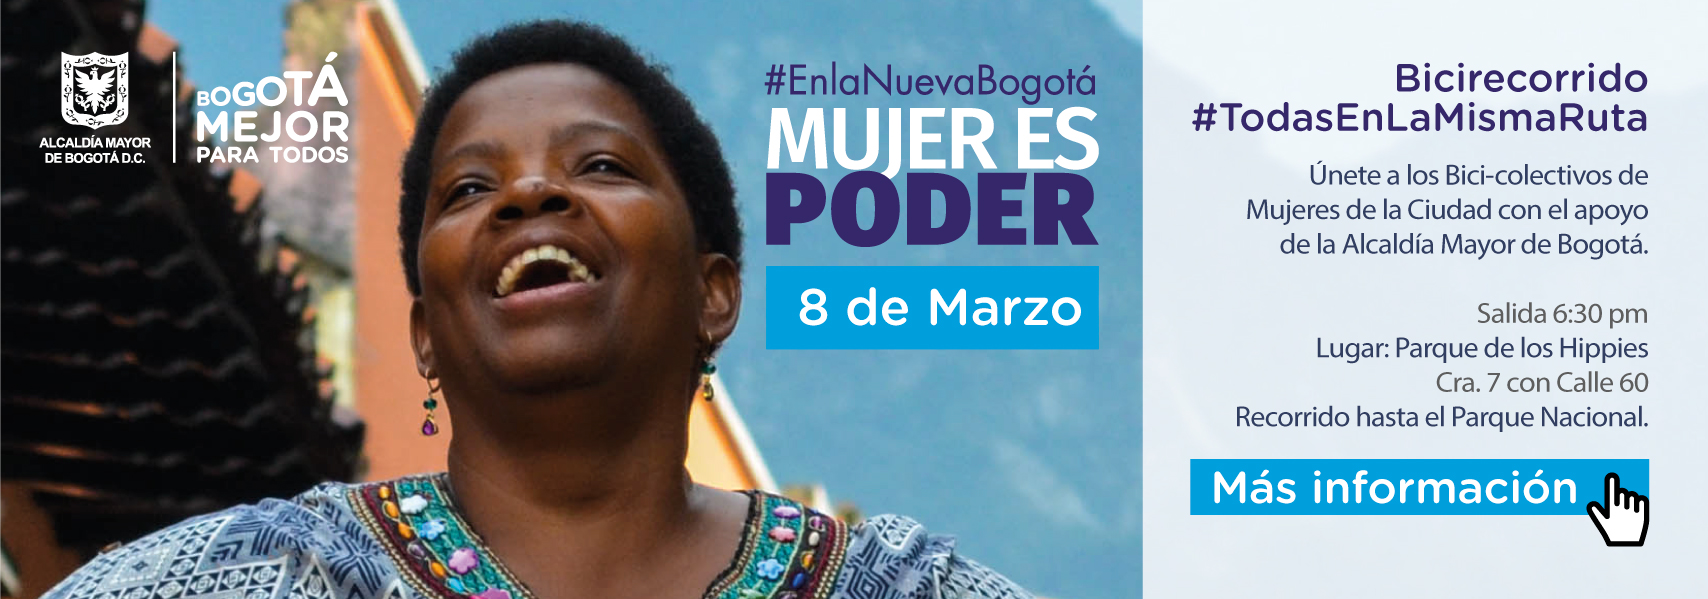 #EnlaNuevaBogotá Mujer es Poder